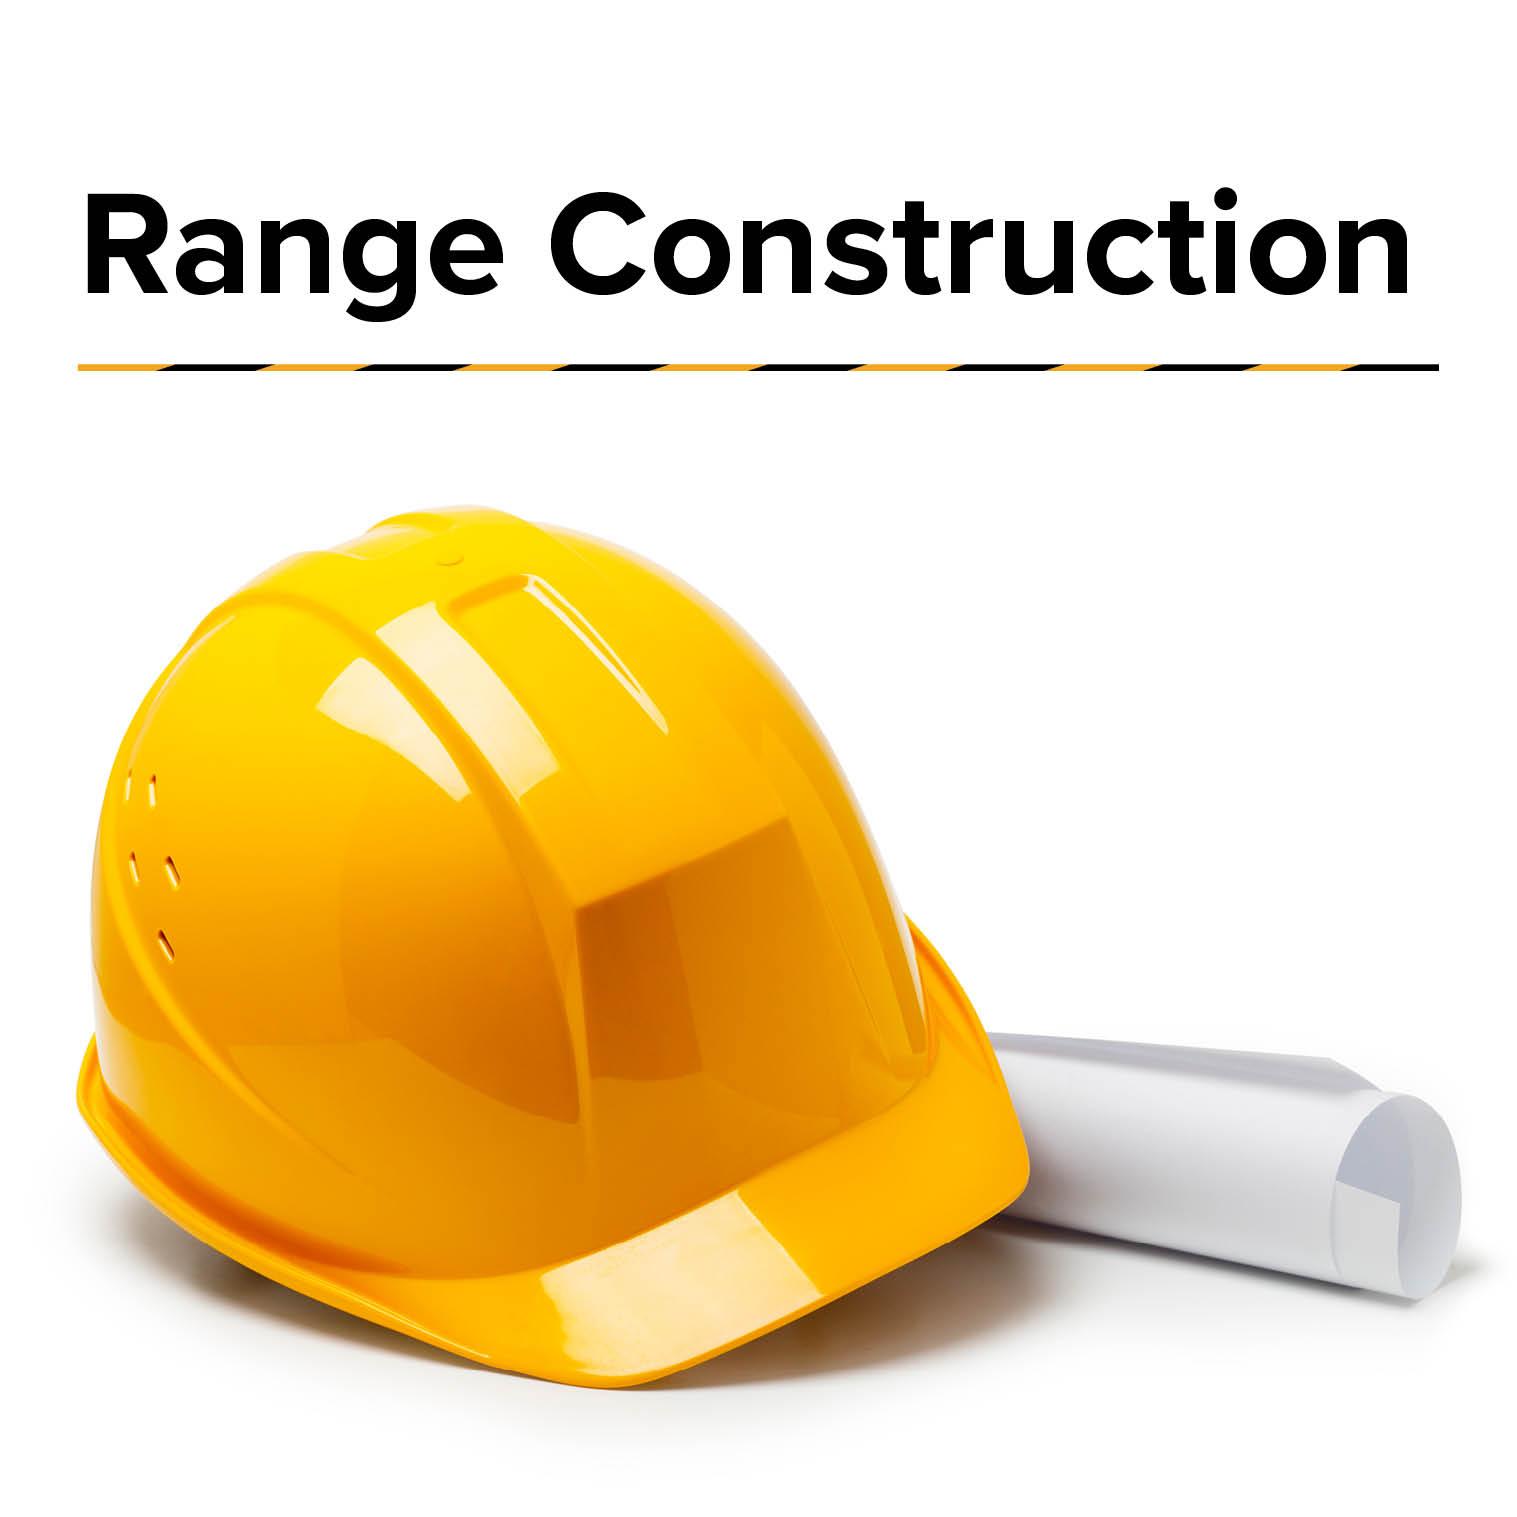 2019 Jackson Park Range Construction